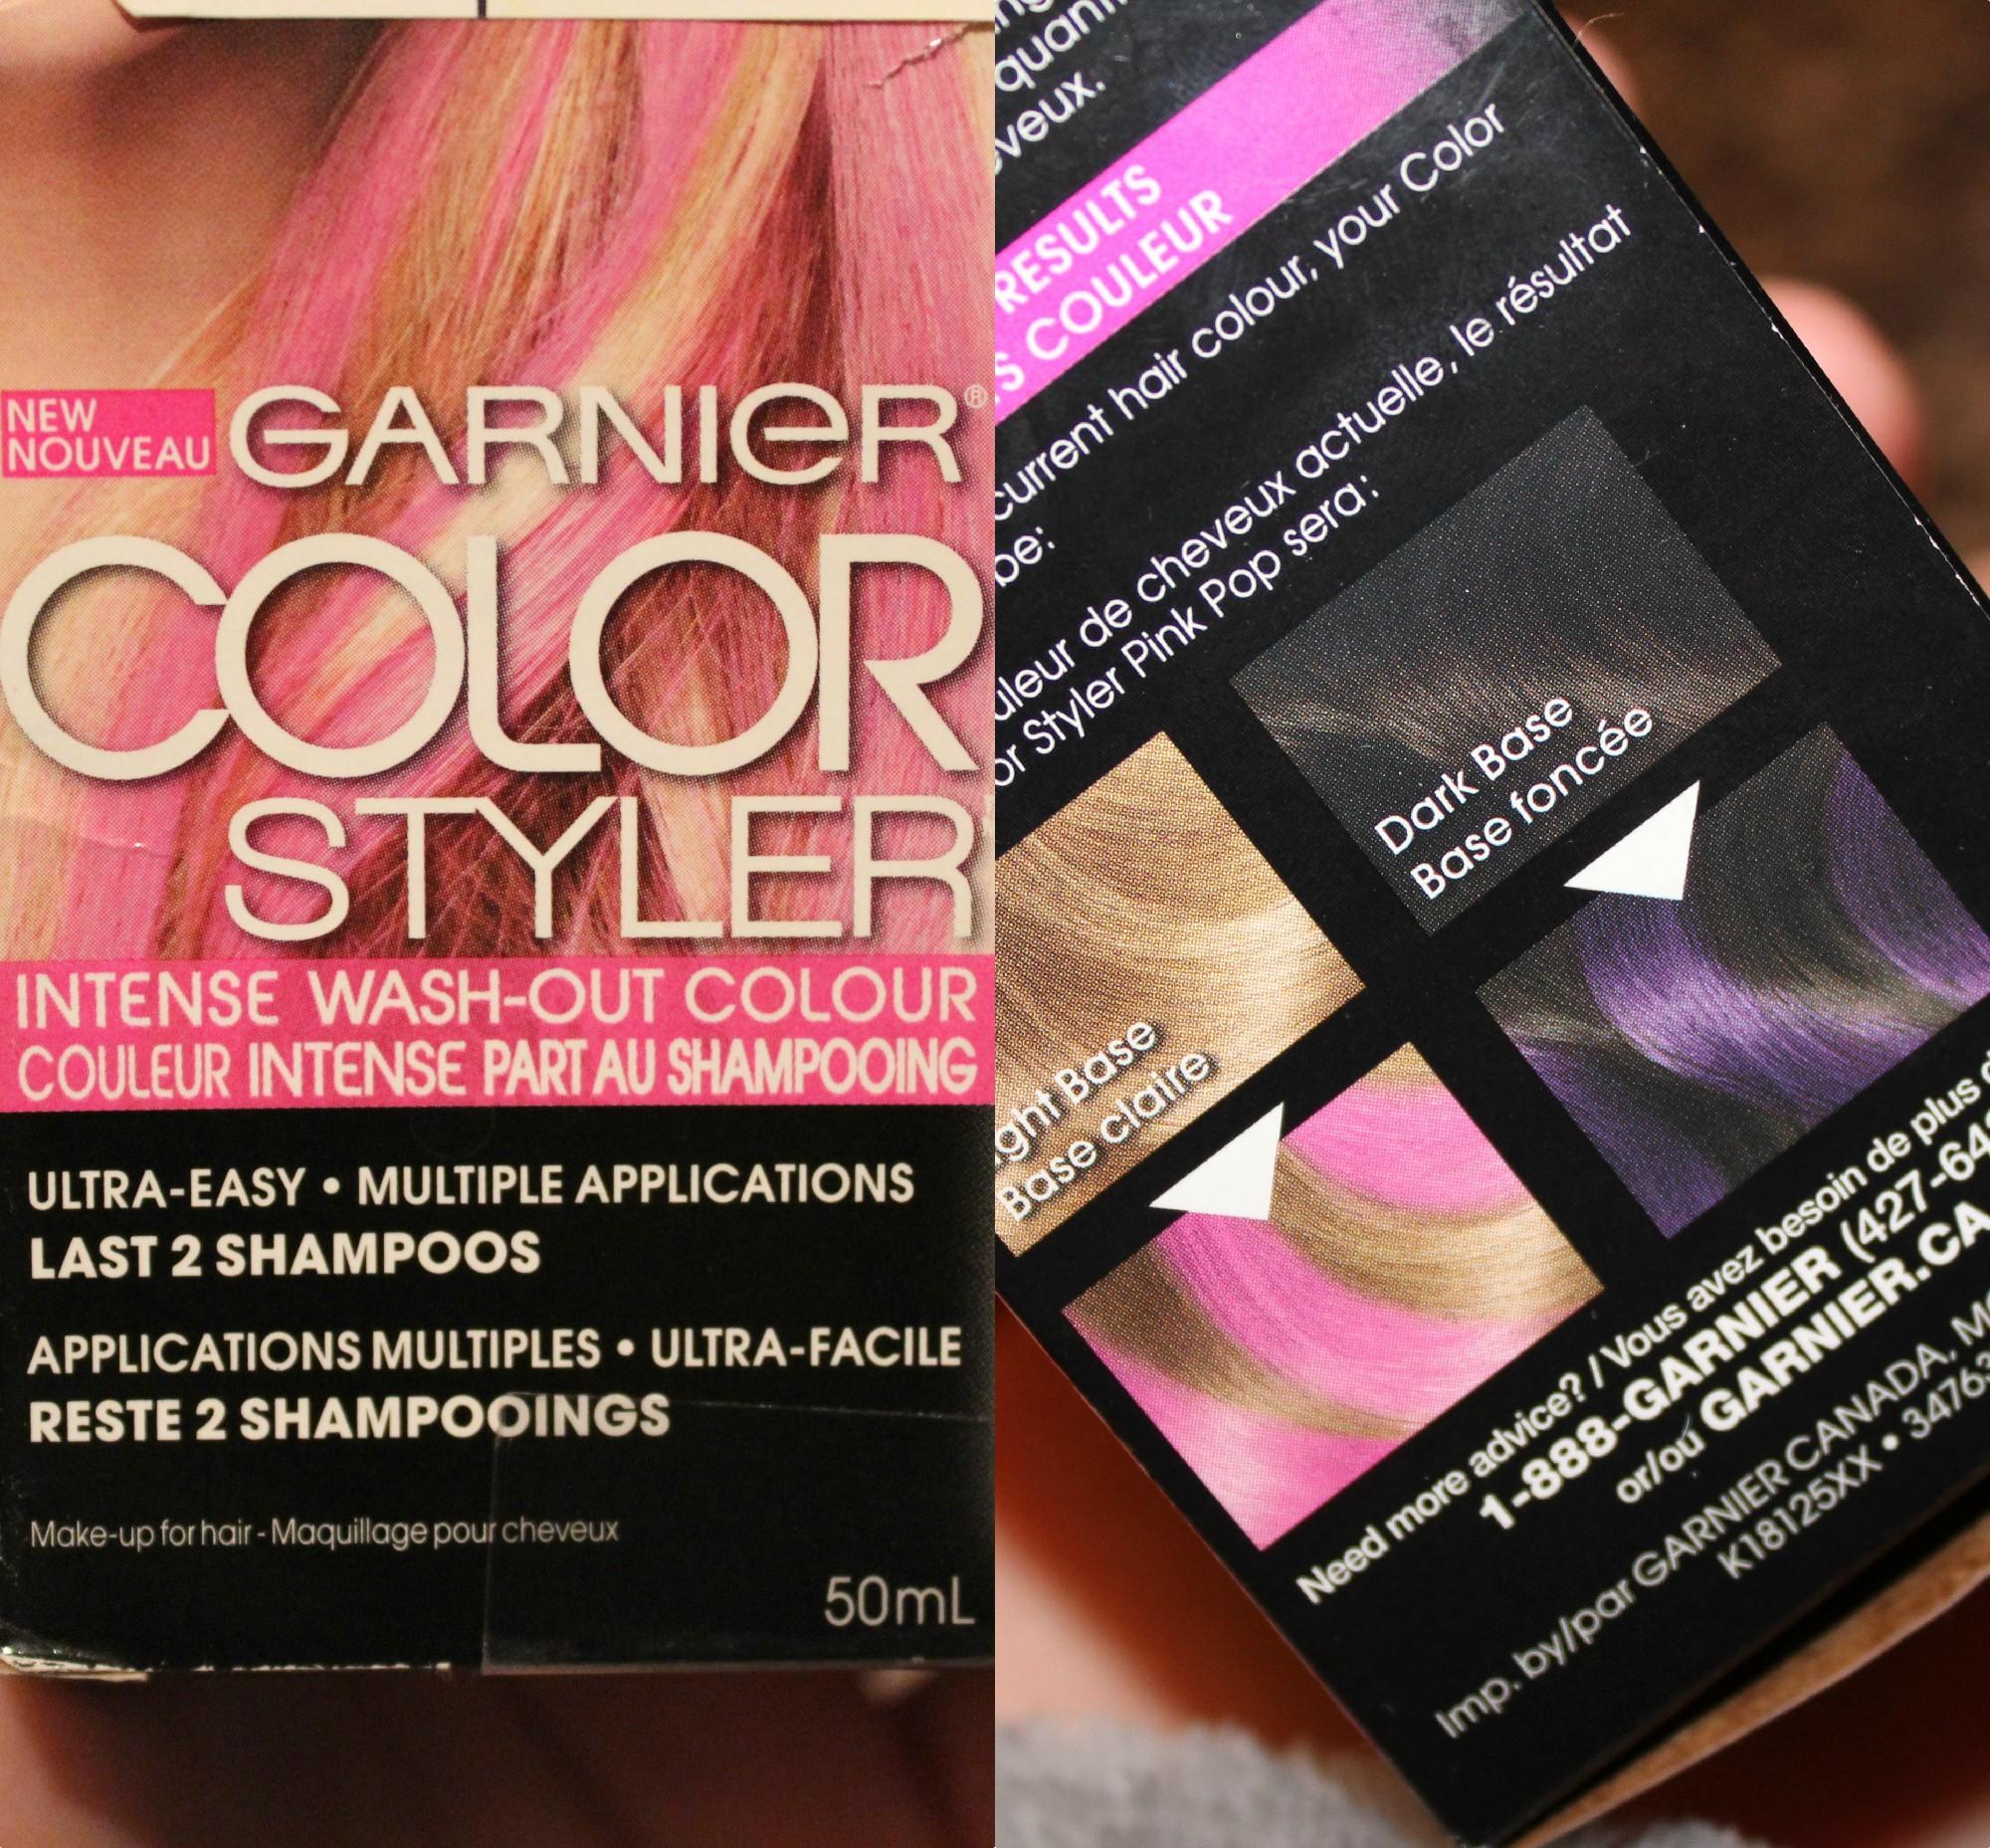 Garnier Color Styler Intense Wash Out Colour Reviews In Hair Colour